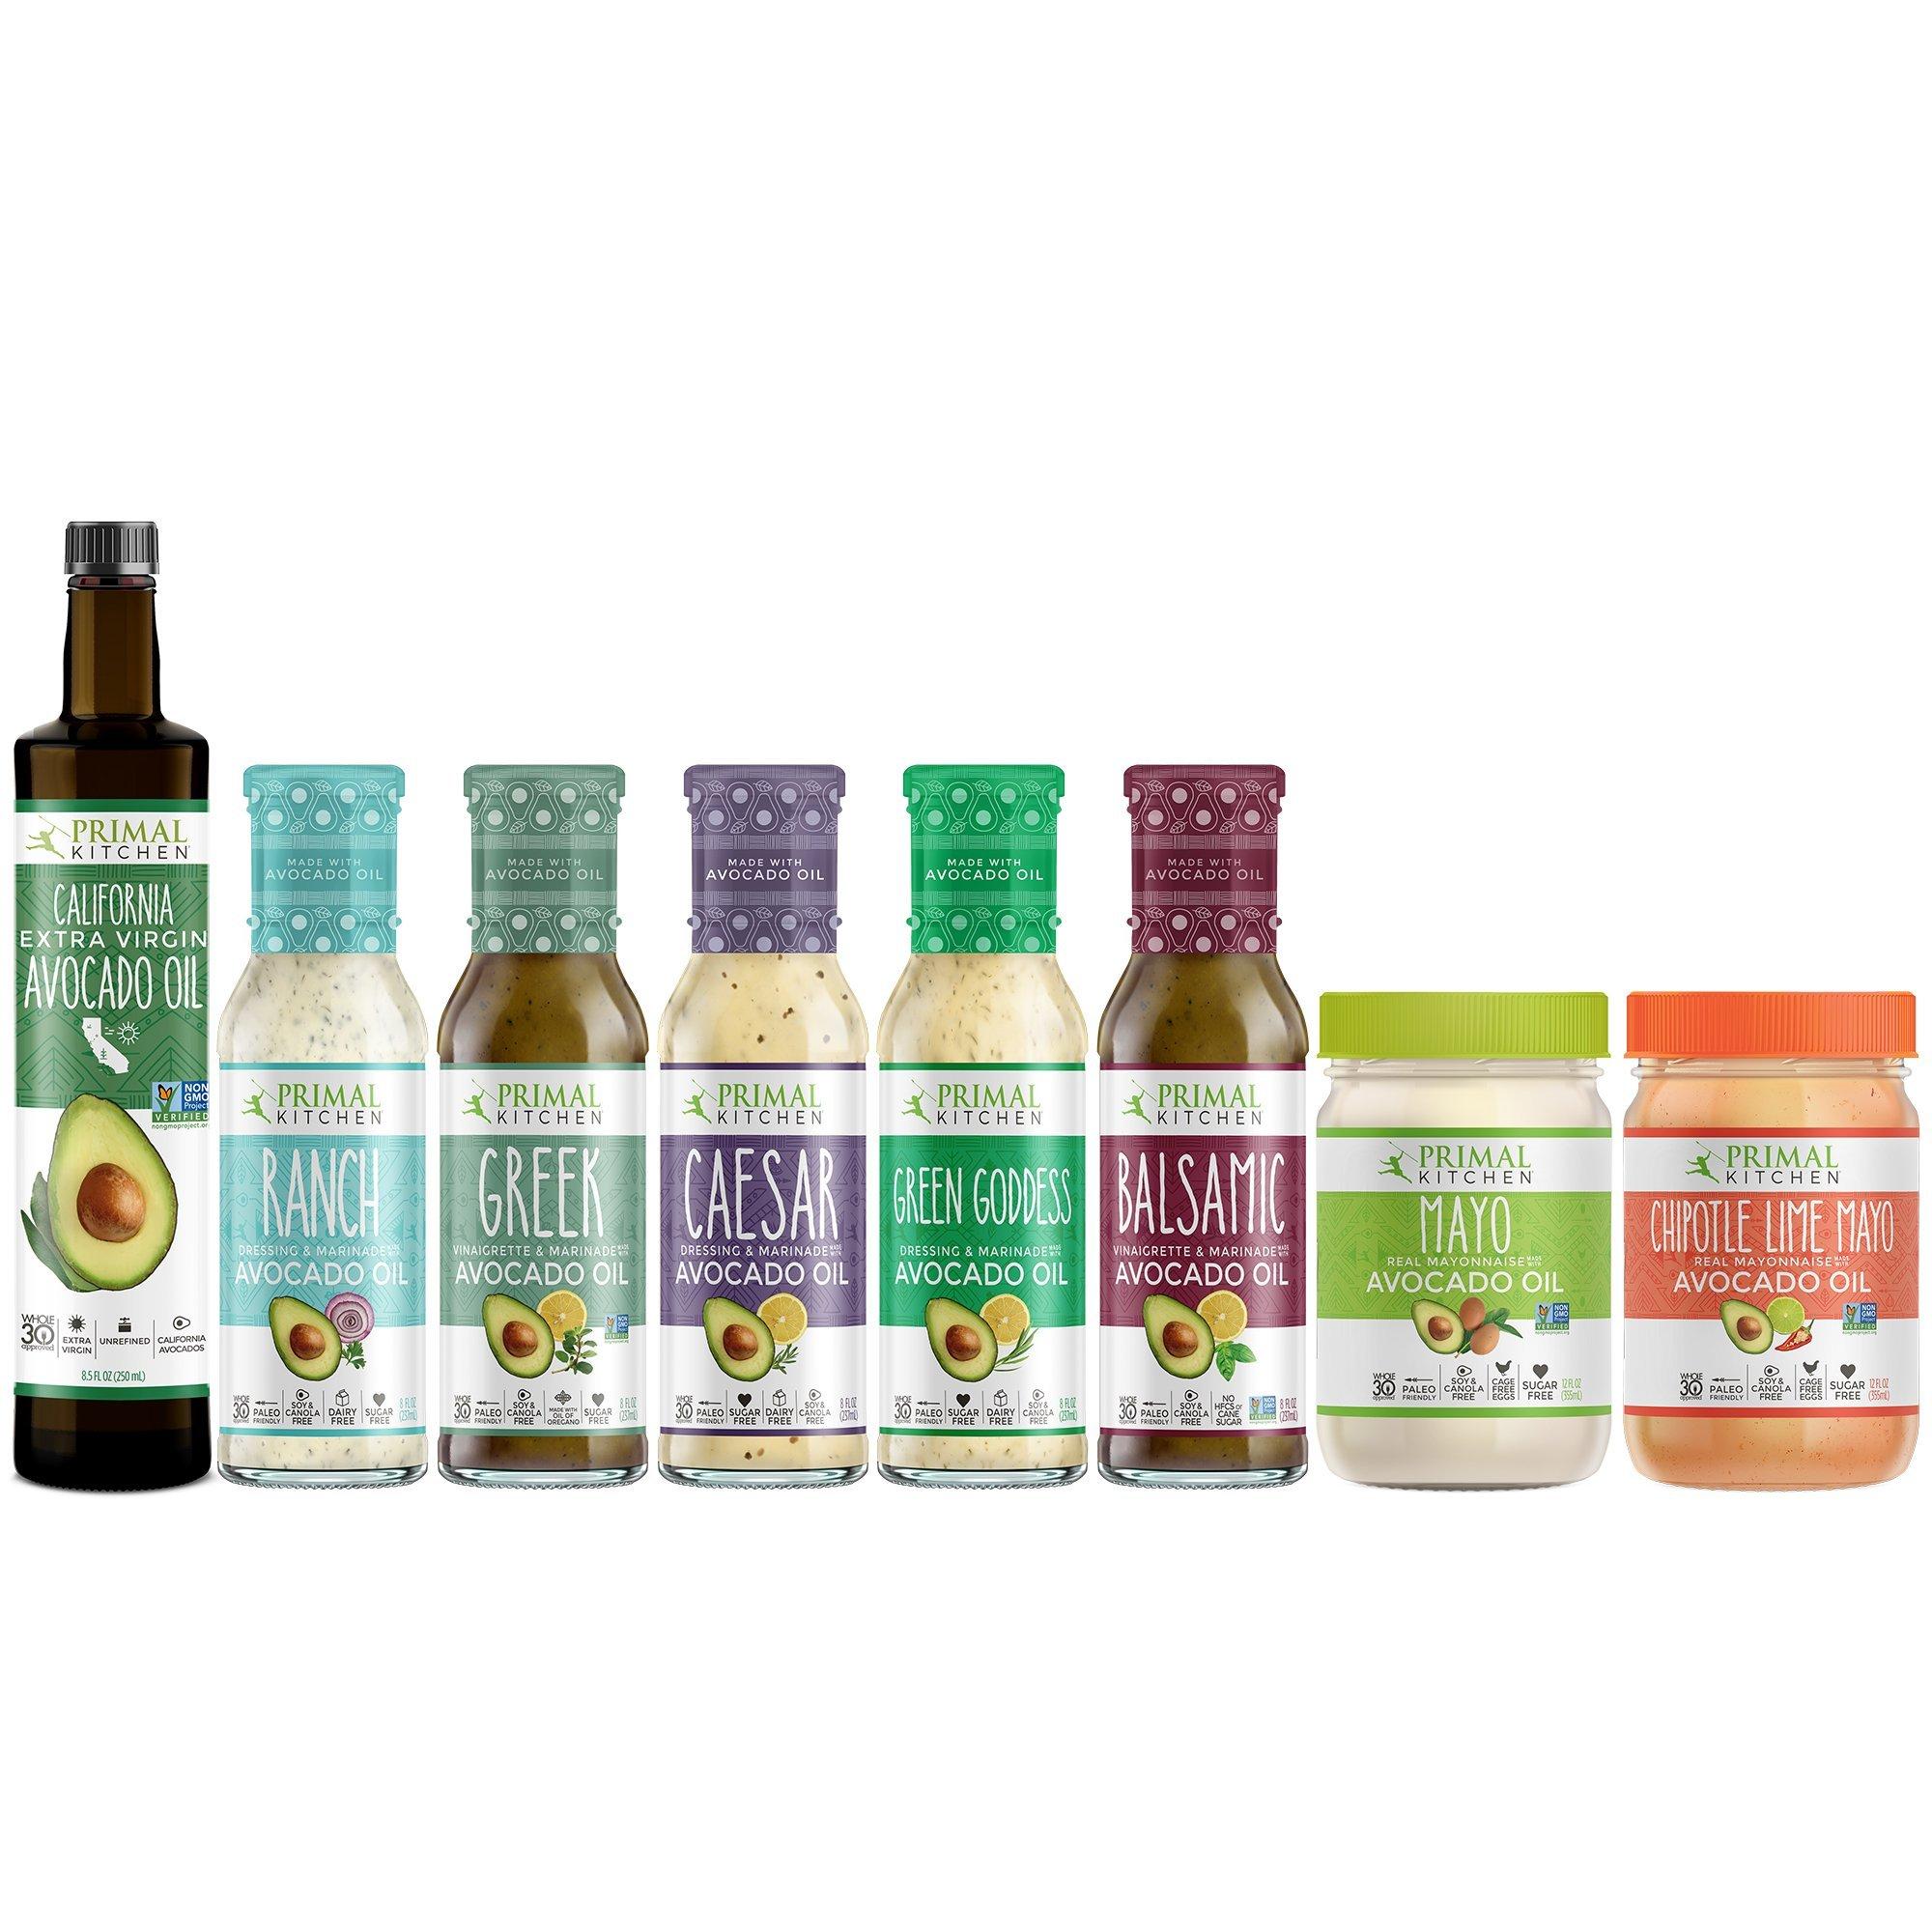 Primal Kitchen Keto Advanced Kit Includes Extra Virgin Avocado Oil, Avocado Oil Mayo, and Avocado Oil Dressings (8 count)